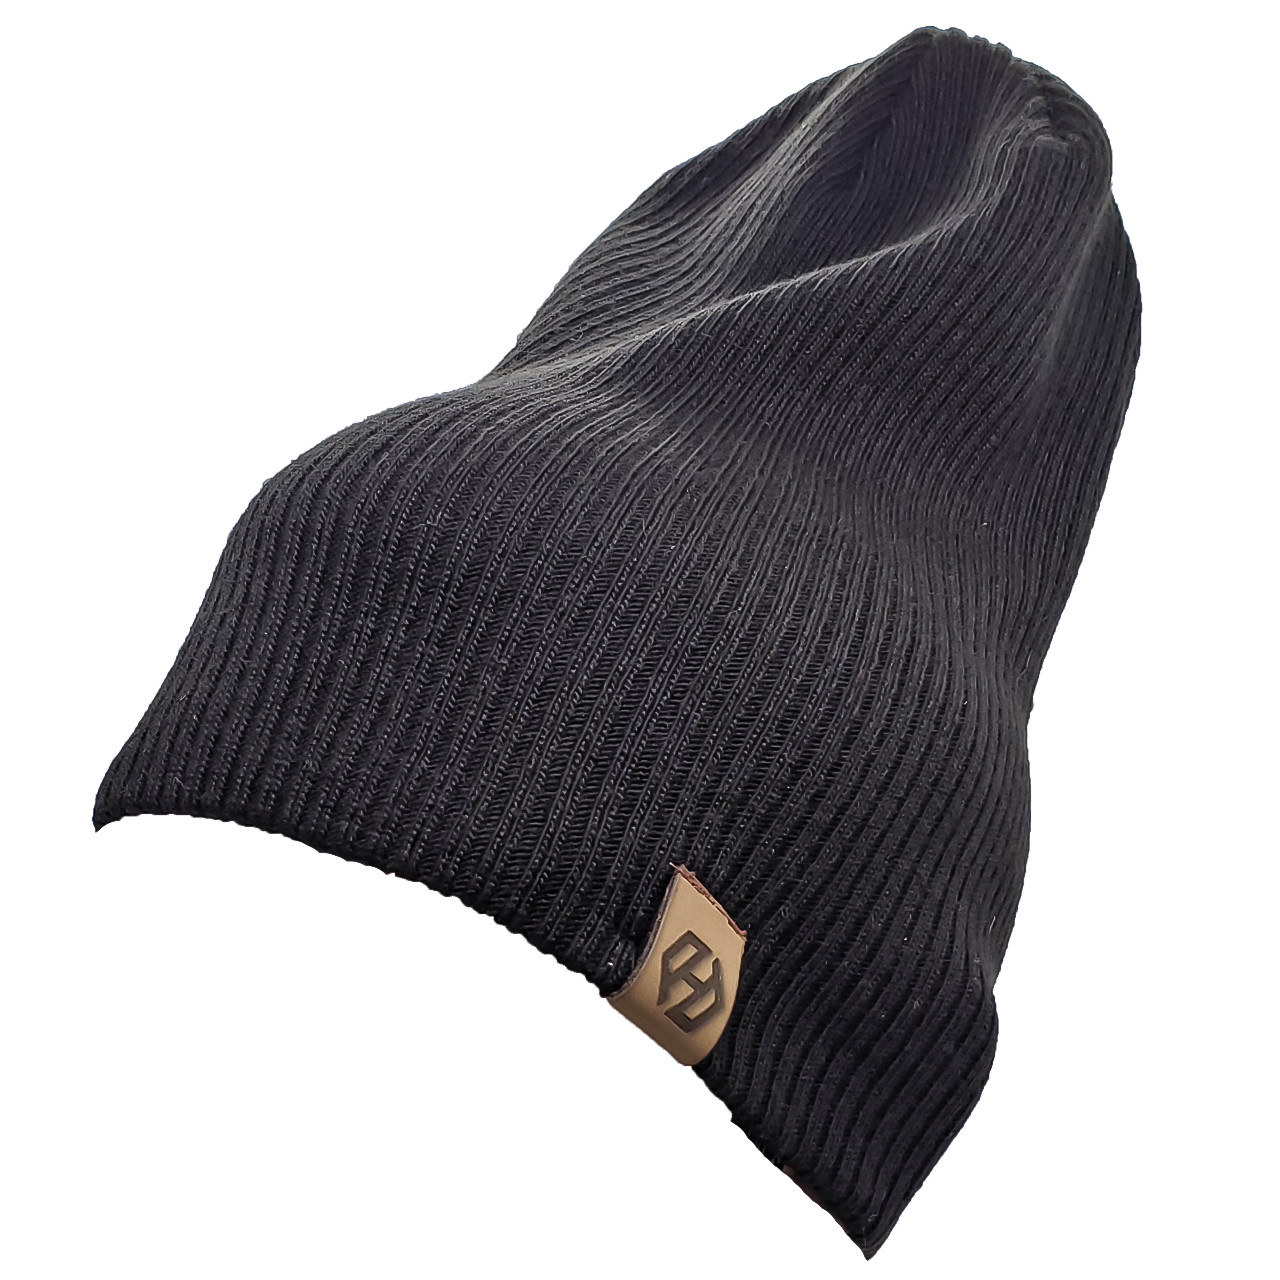 Шапка моднаяТрансформер HatsLight kinoro унисекс размер взрослый, черная